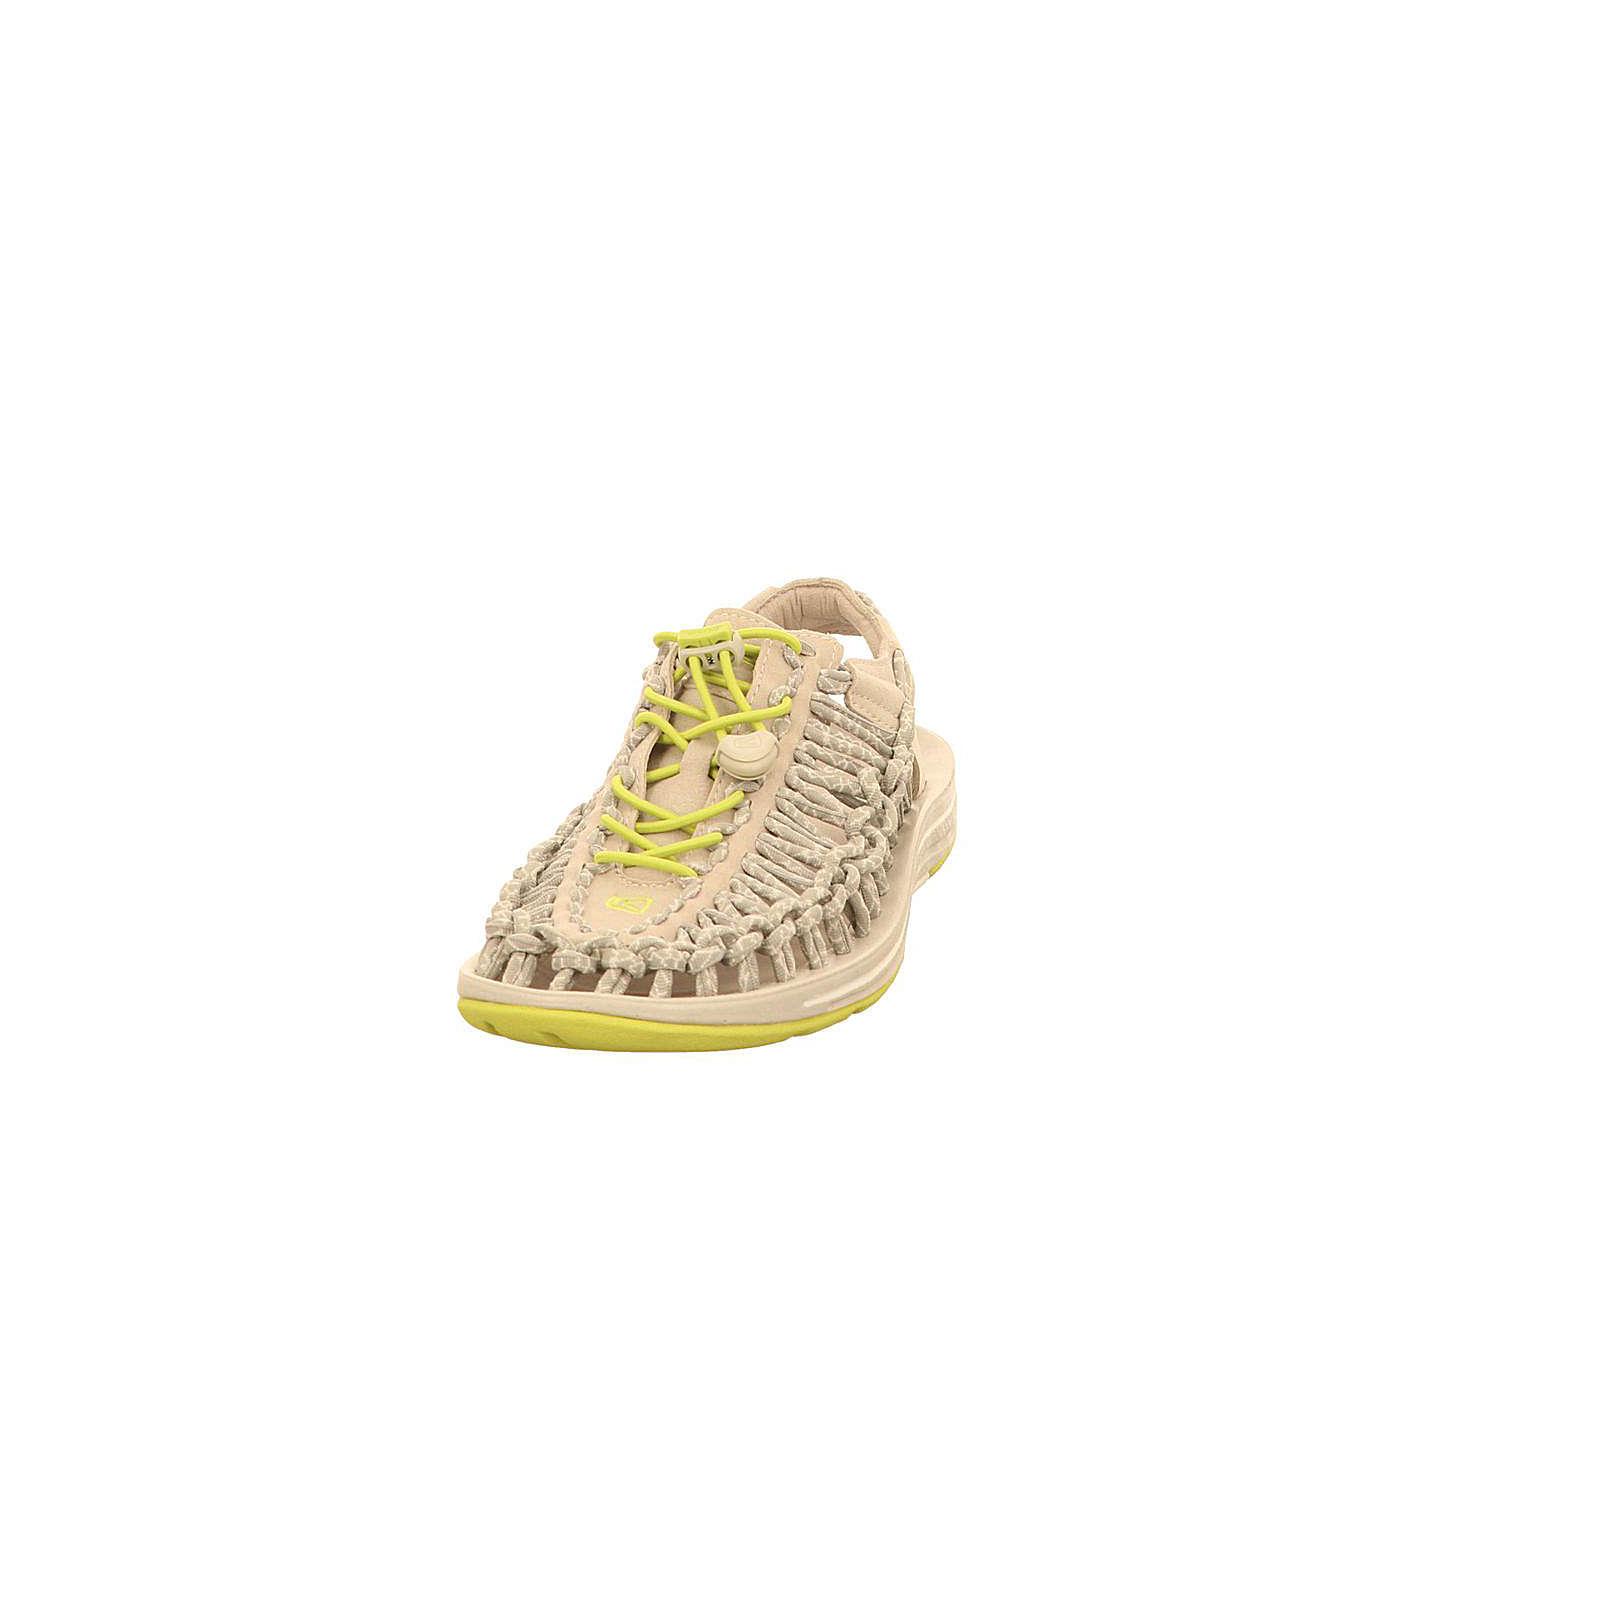 KEEN Klassische Sandaletten grau Damen Gr. 38,5